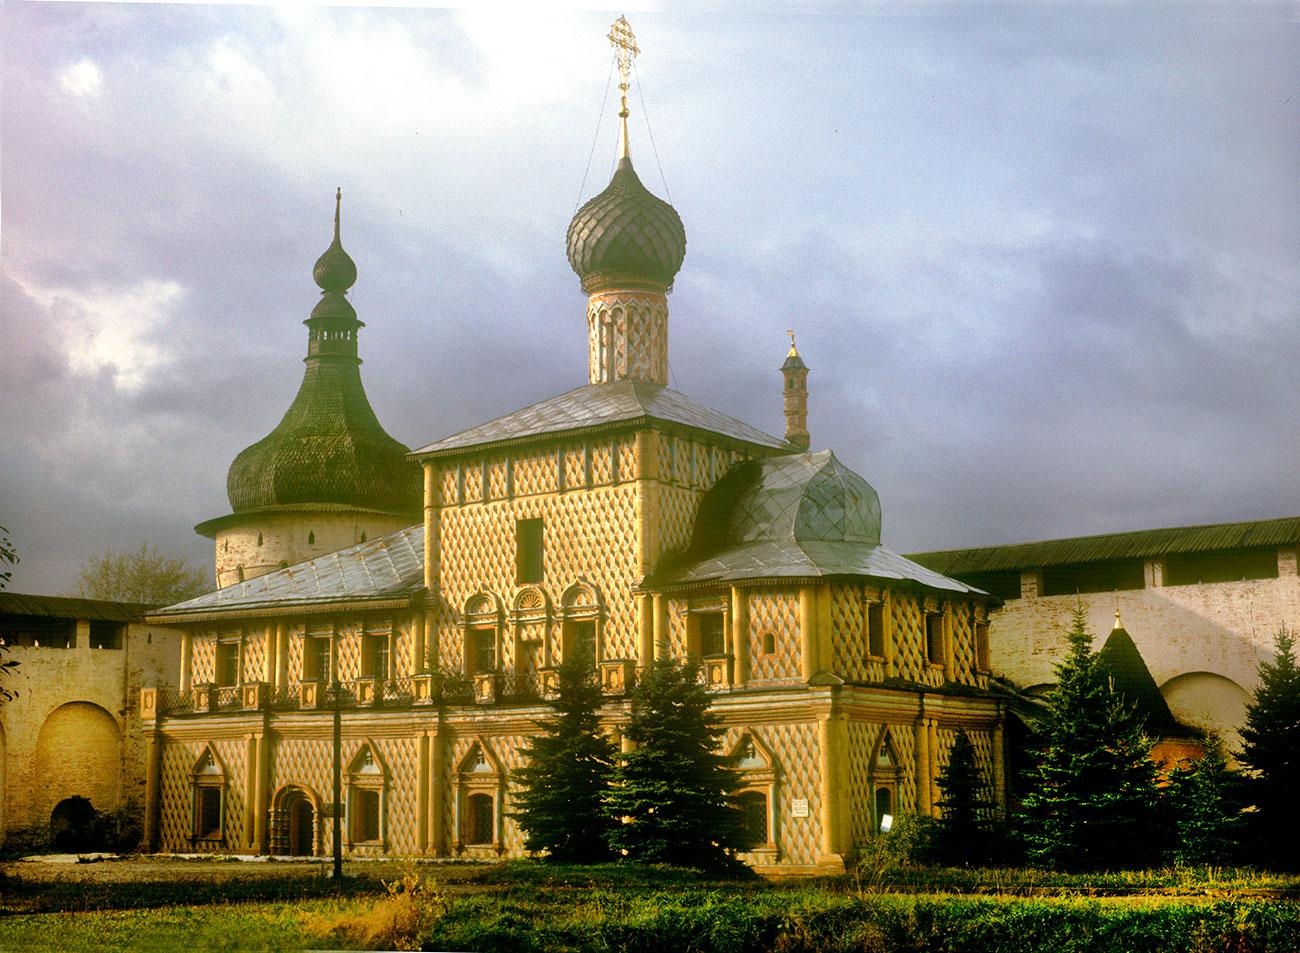 Rostov kremlin. Northwest corner tower&Church of the Hodegetria Icon, southeast view. Oct. 4, 1992. / Photo: William Brumfield